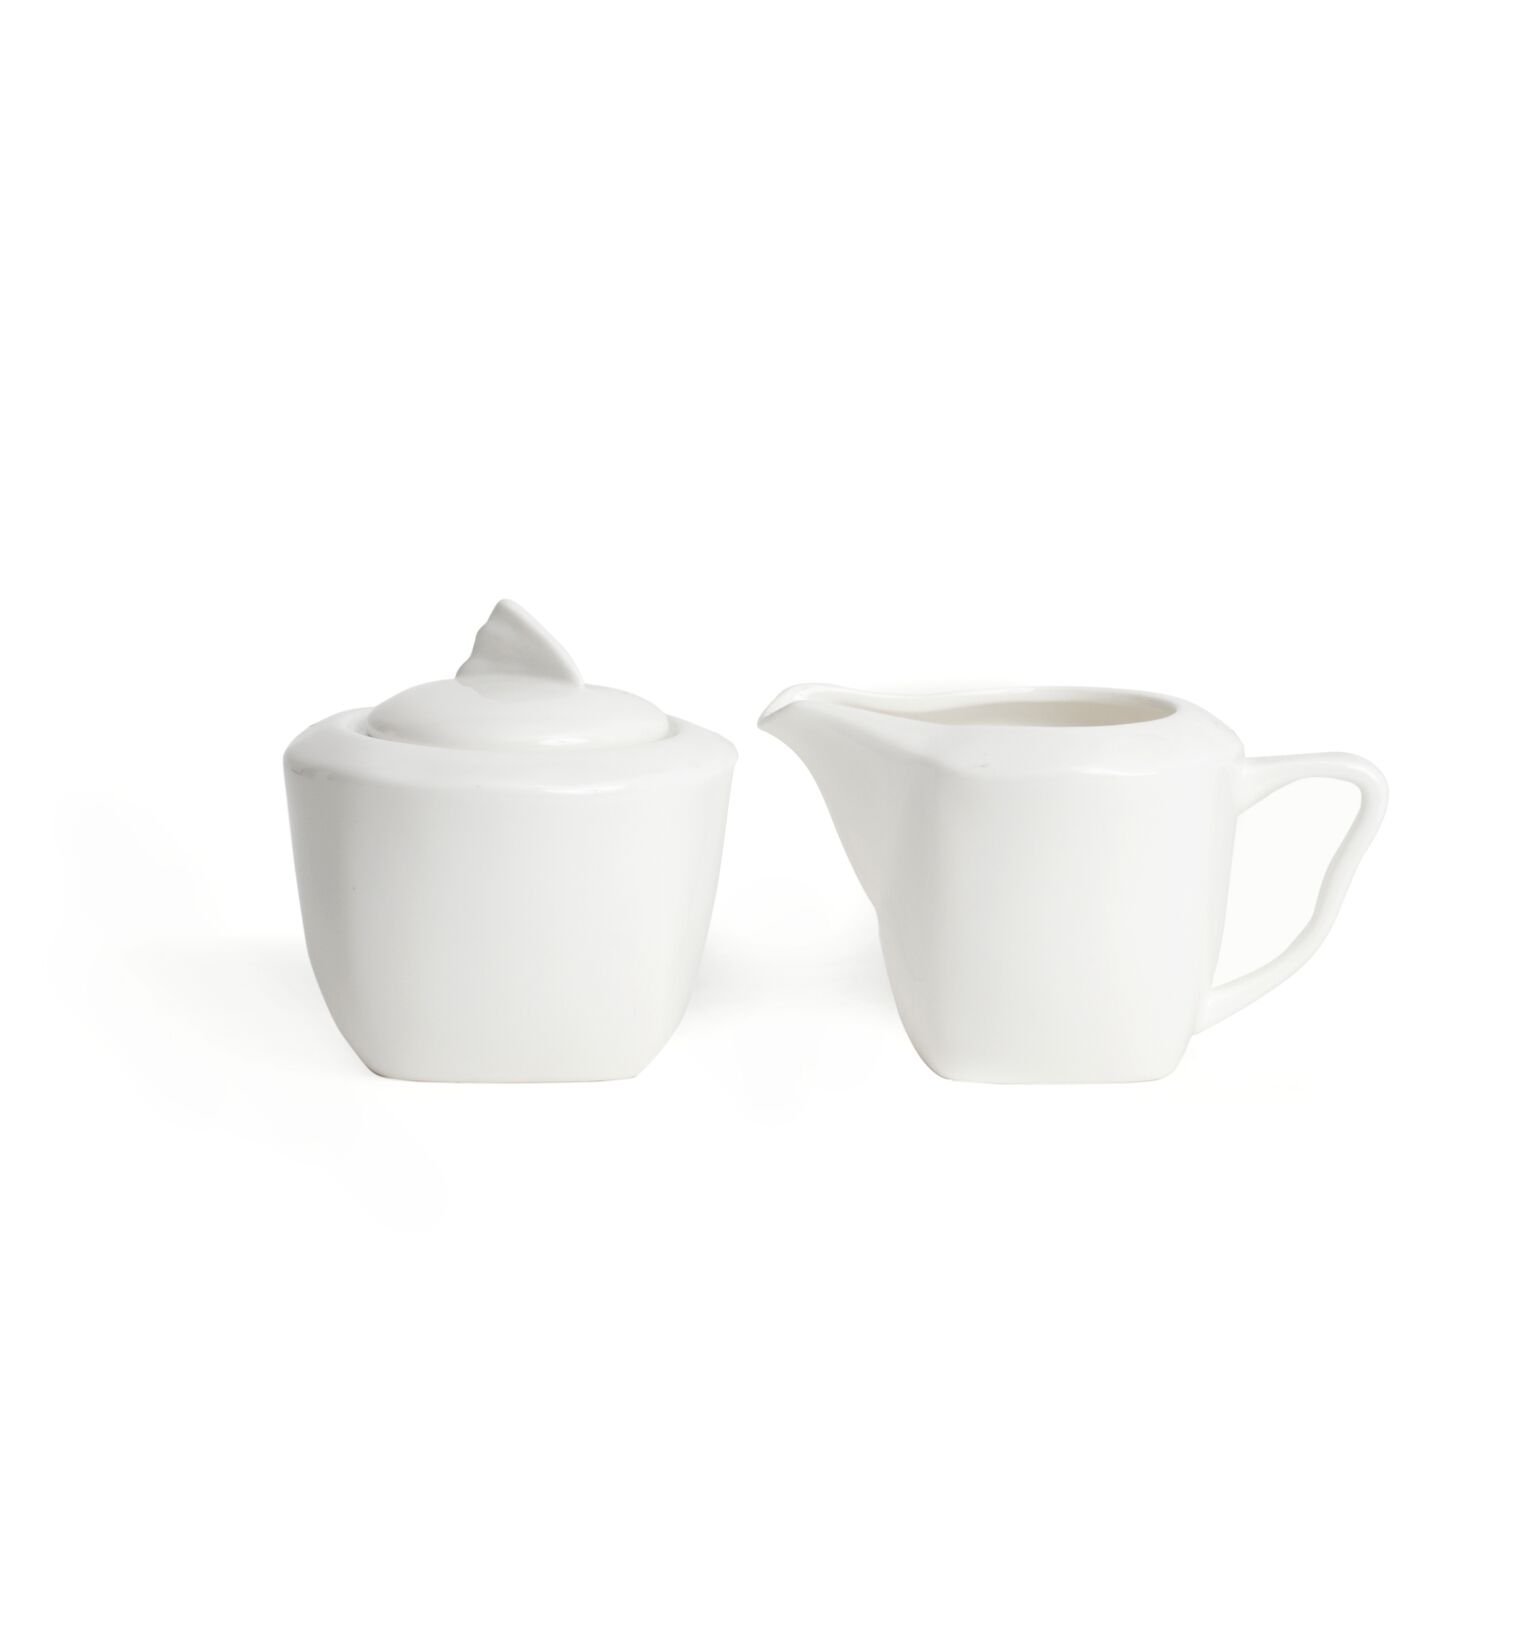 Red Vanilla Wave Covered Sugar Bowl and Creamer Set